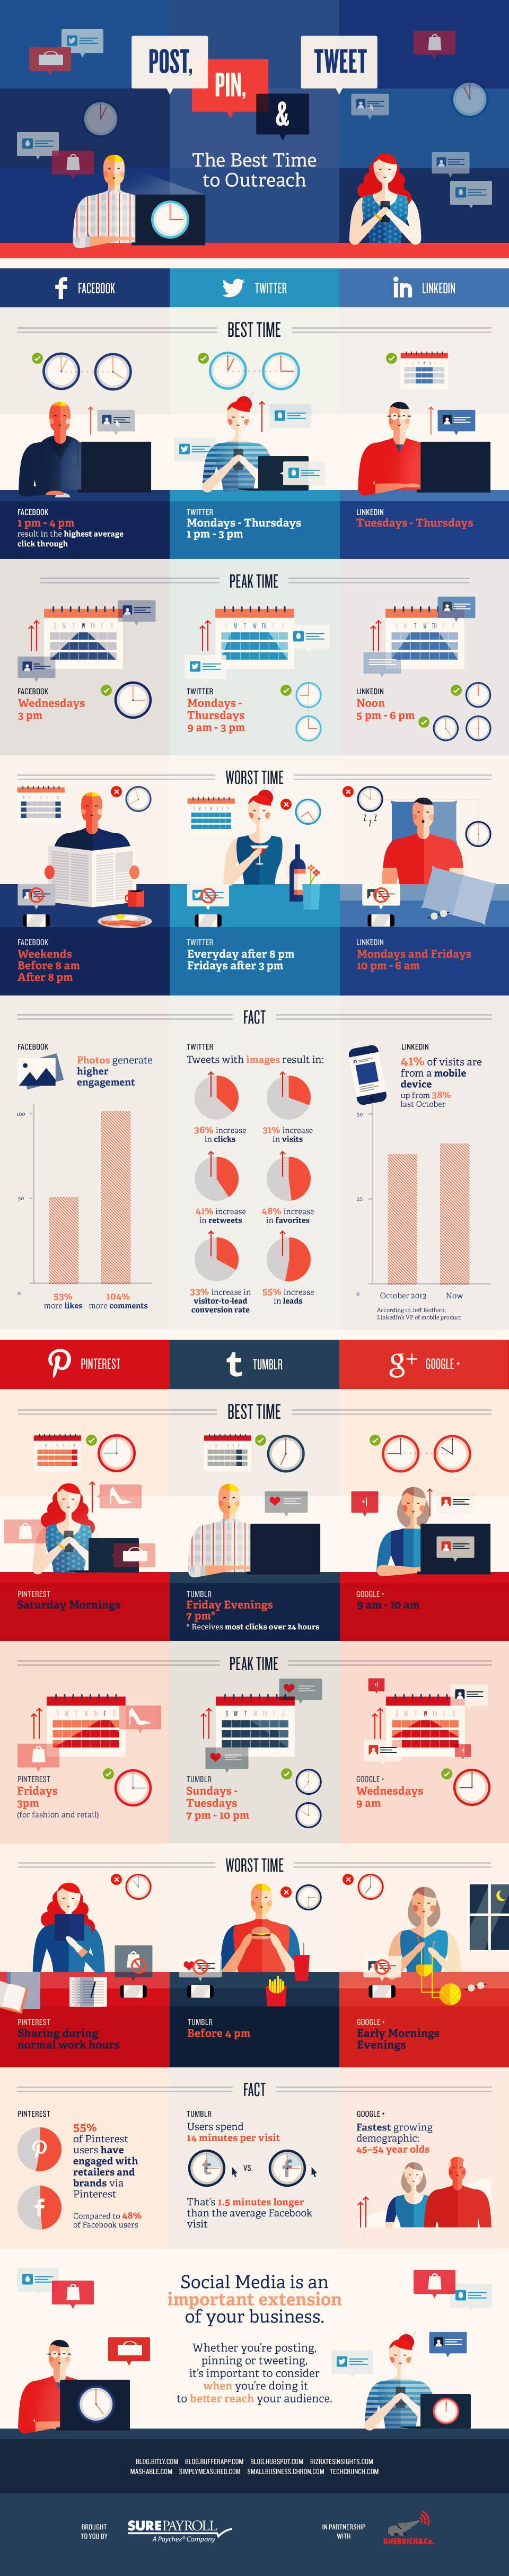 sosyal-medya-zaman